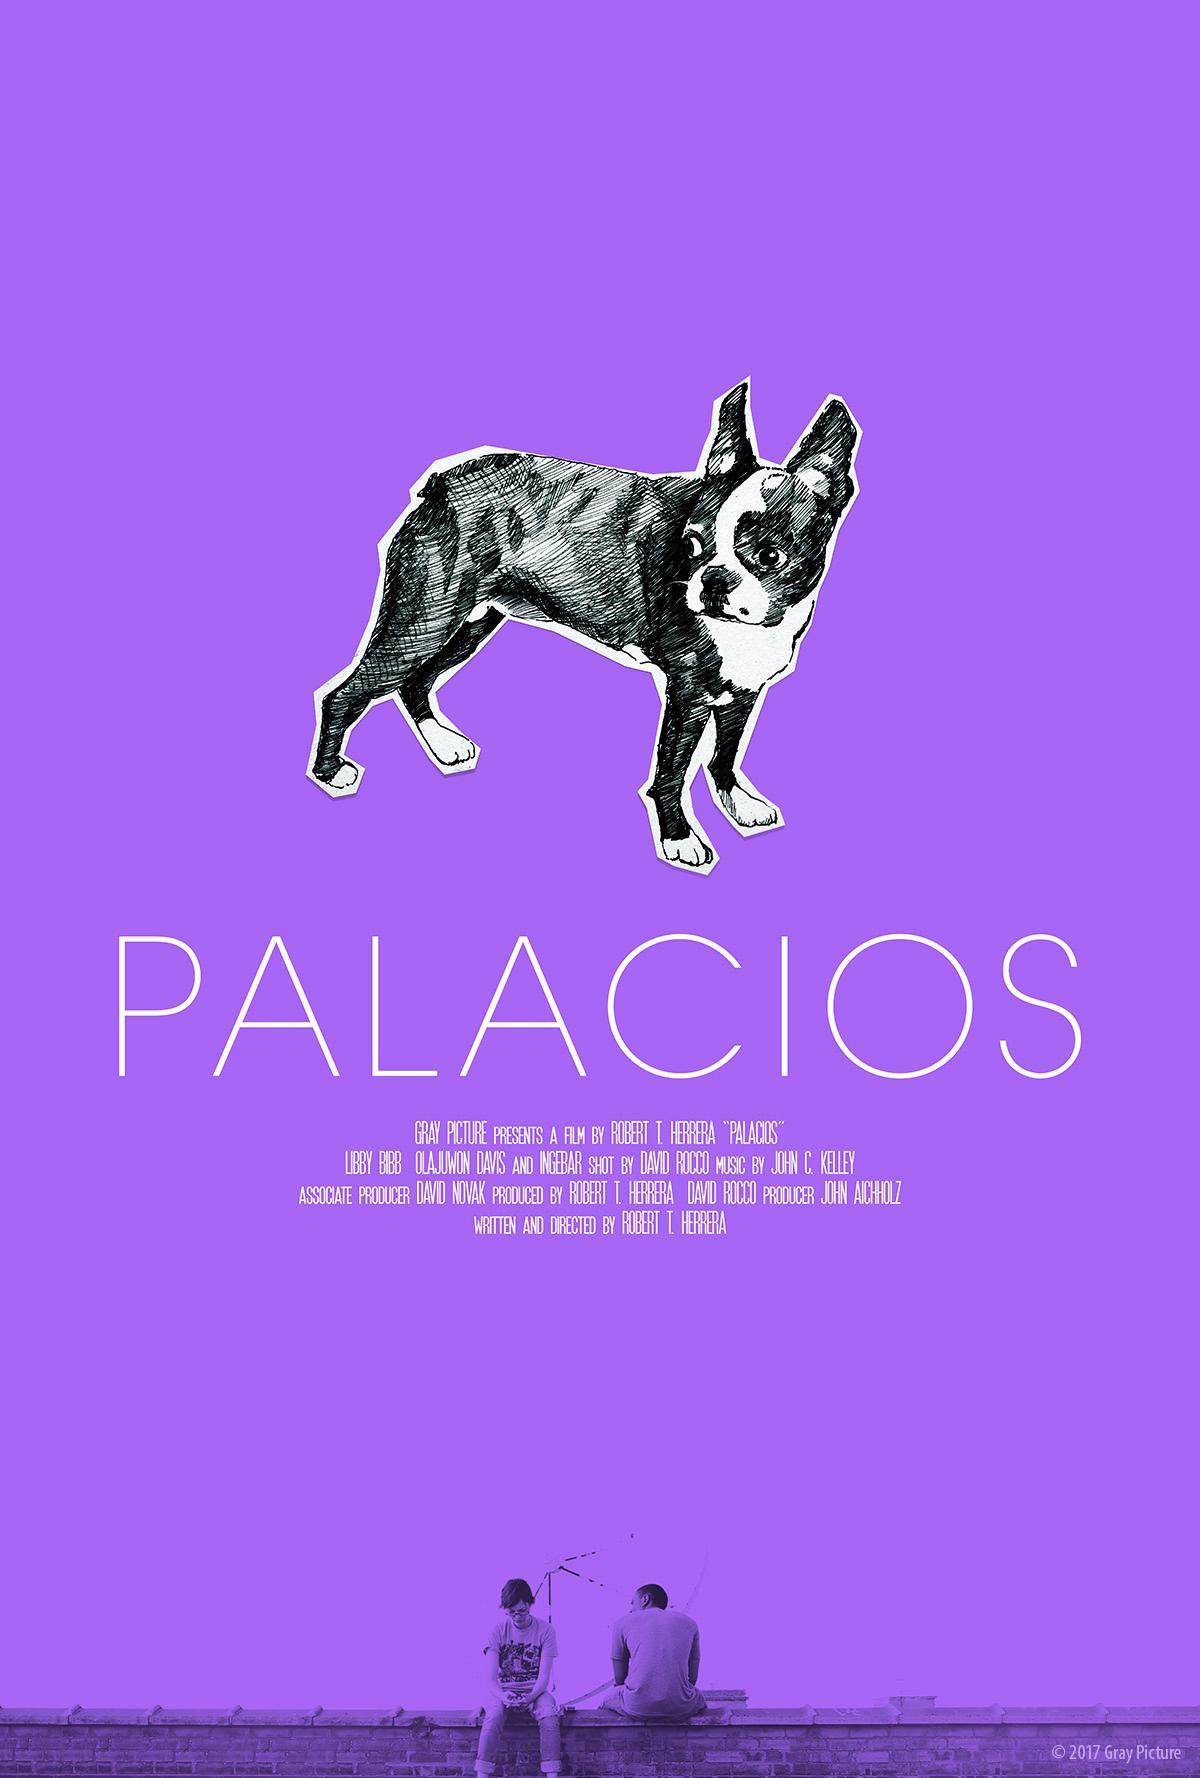 Palacios_one_sheet_1200x1778_Final_RGB (1).jpg